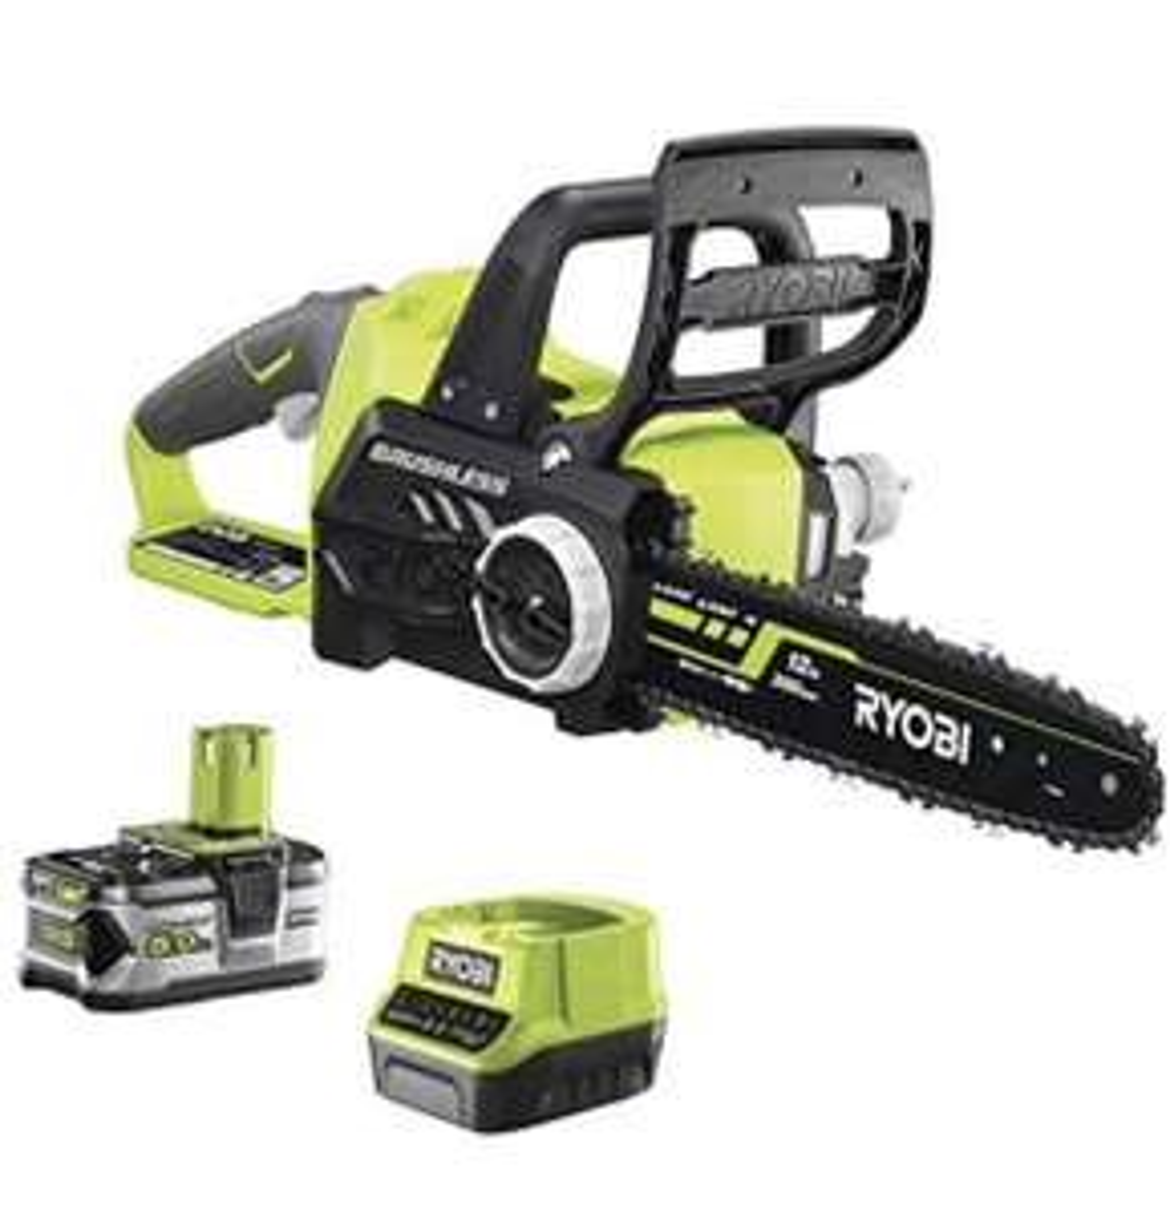 Ryobi RCS1830-150 18V ONE+ Cordless Brushless 30cm Chainsaw Kit (1 x 5.0Ah) £169.49 Amazon Prime Exclusive